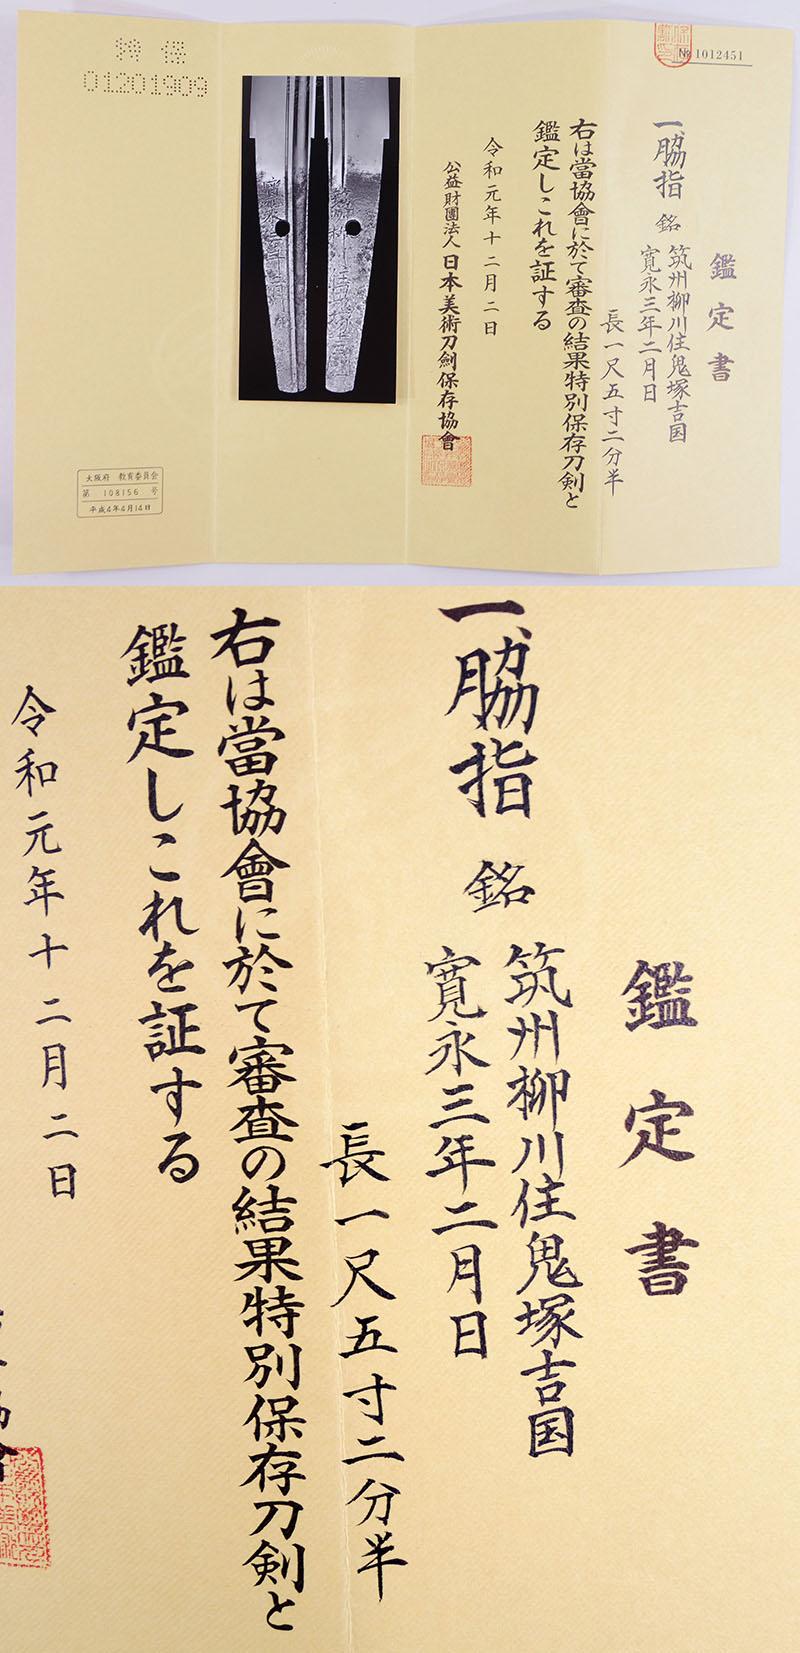 筑州柳川住鬼塚吉国 Picture of Certificate